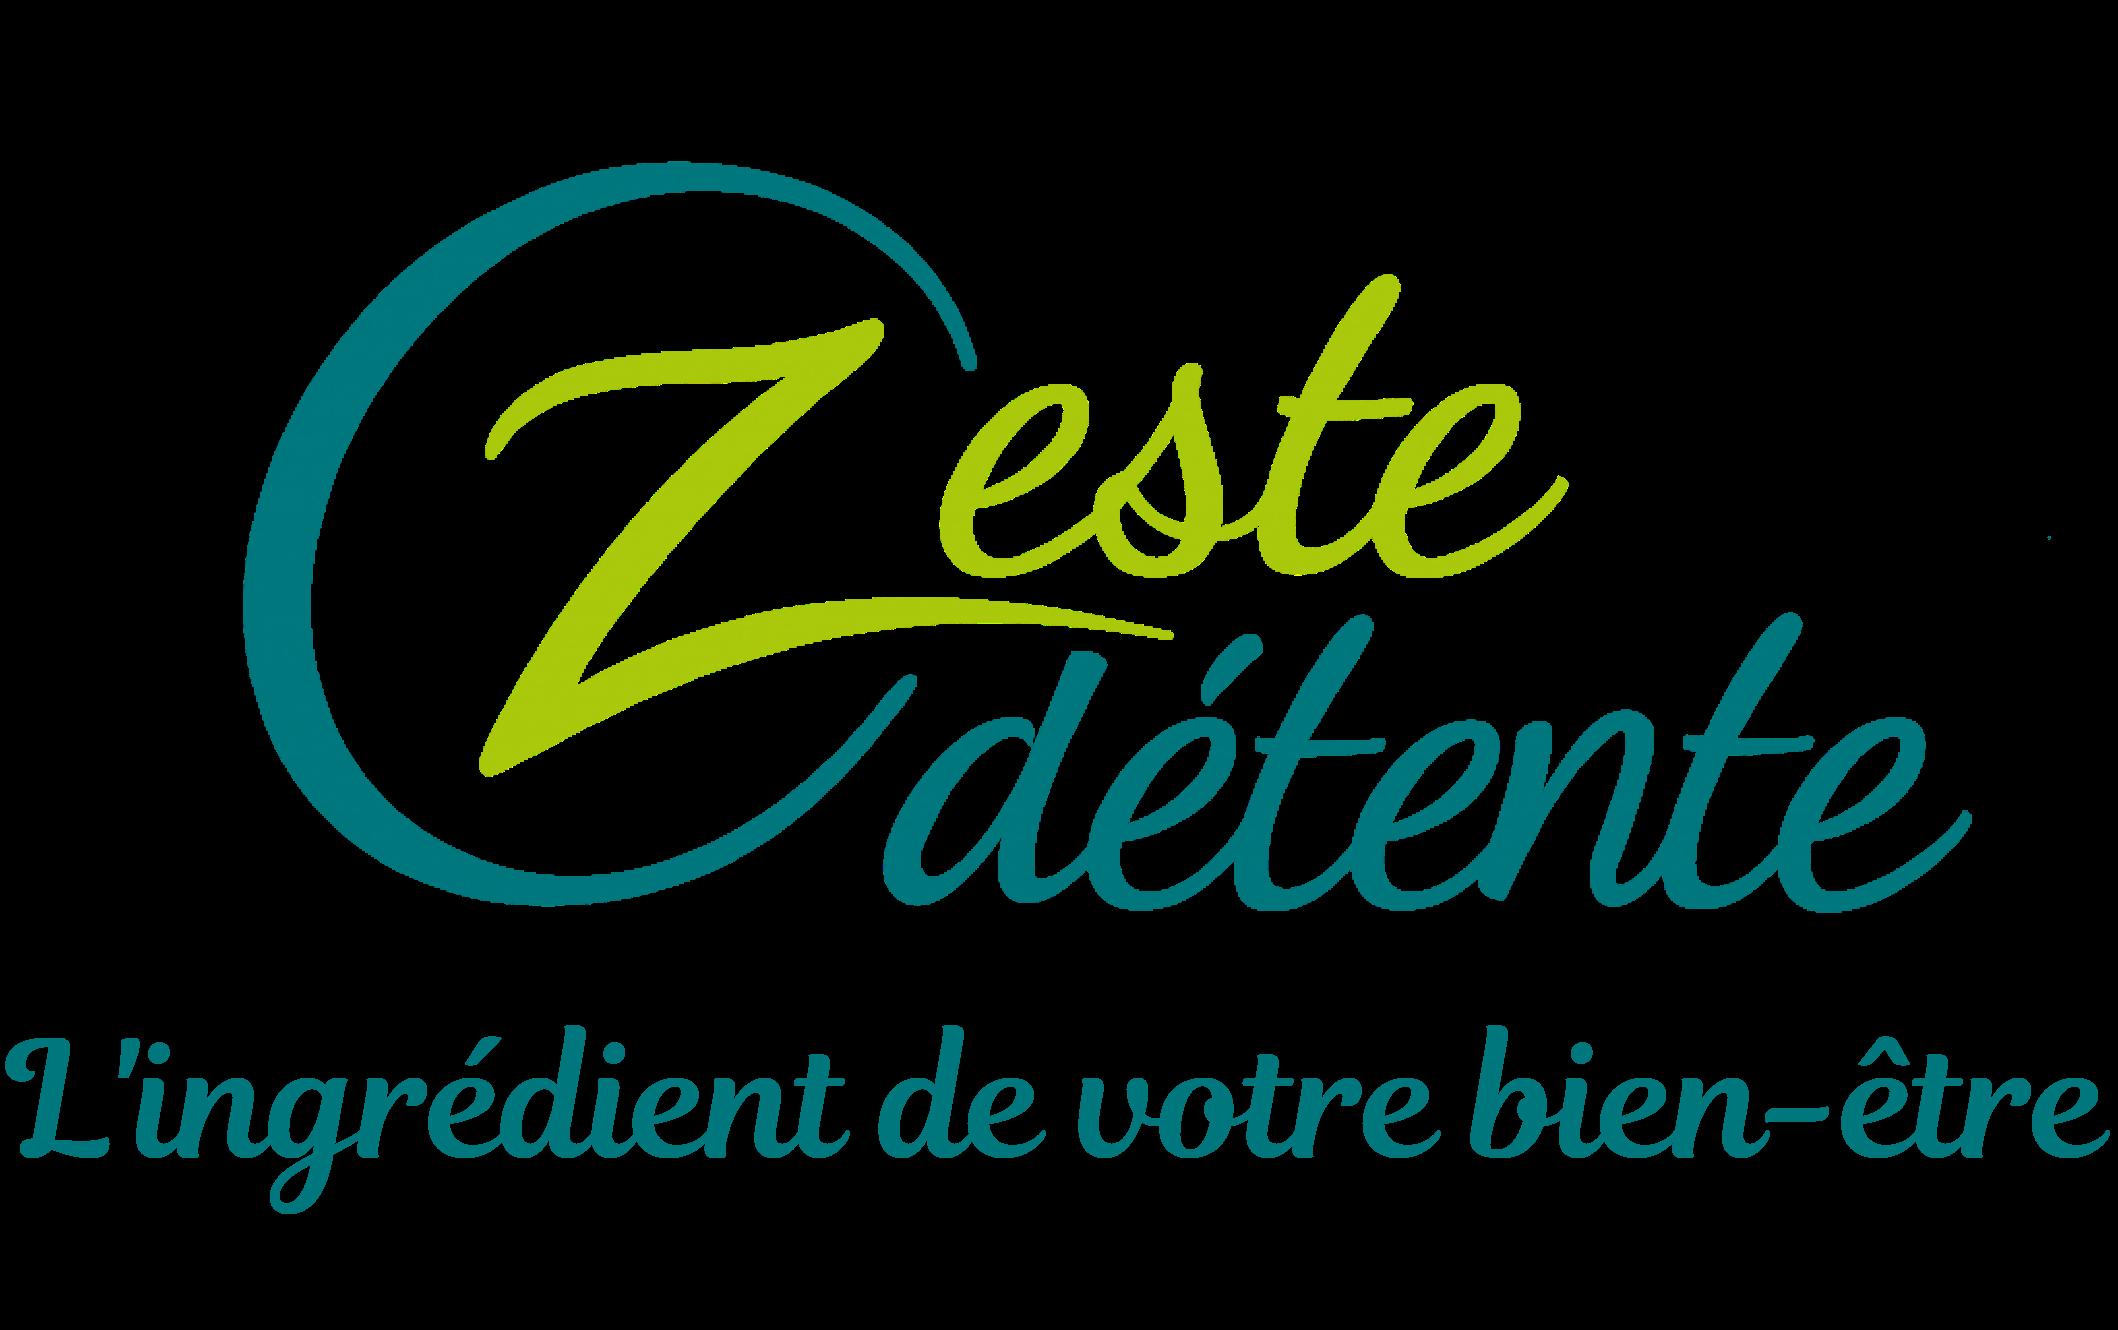 Zeste détente Logo